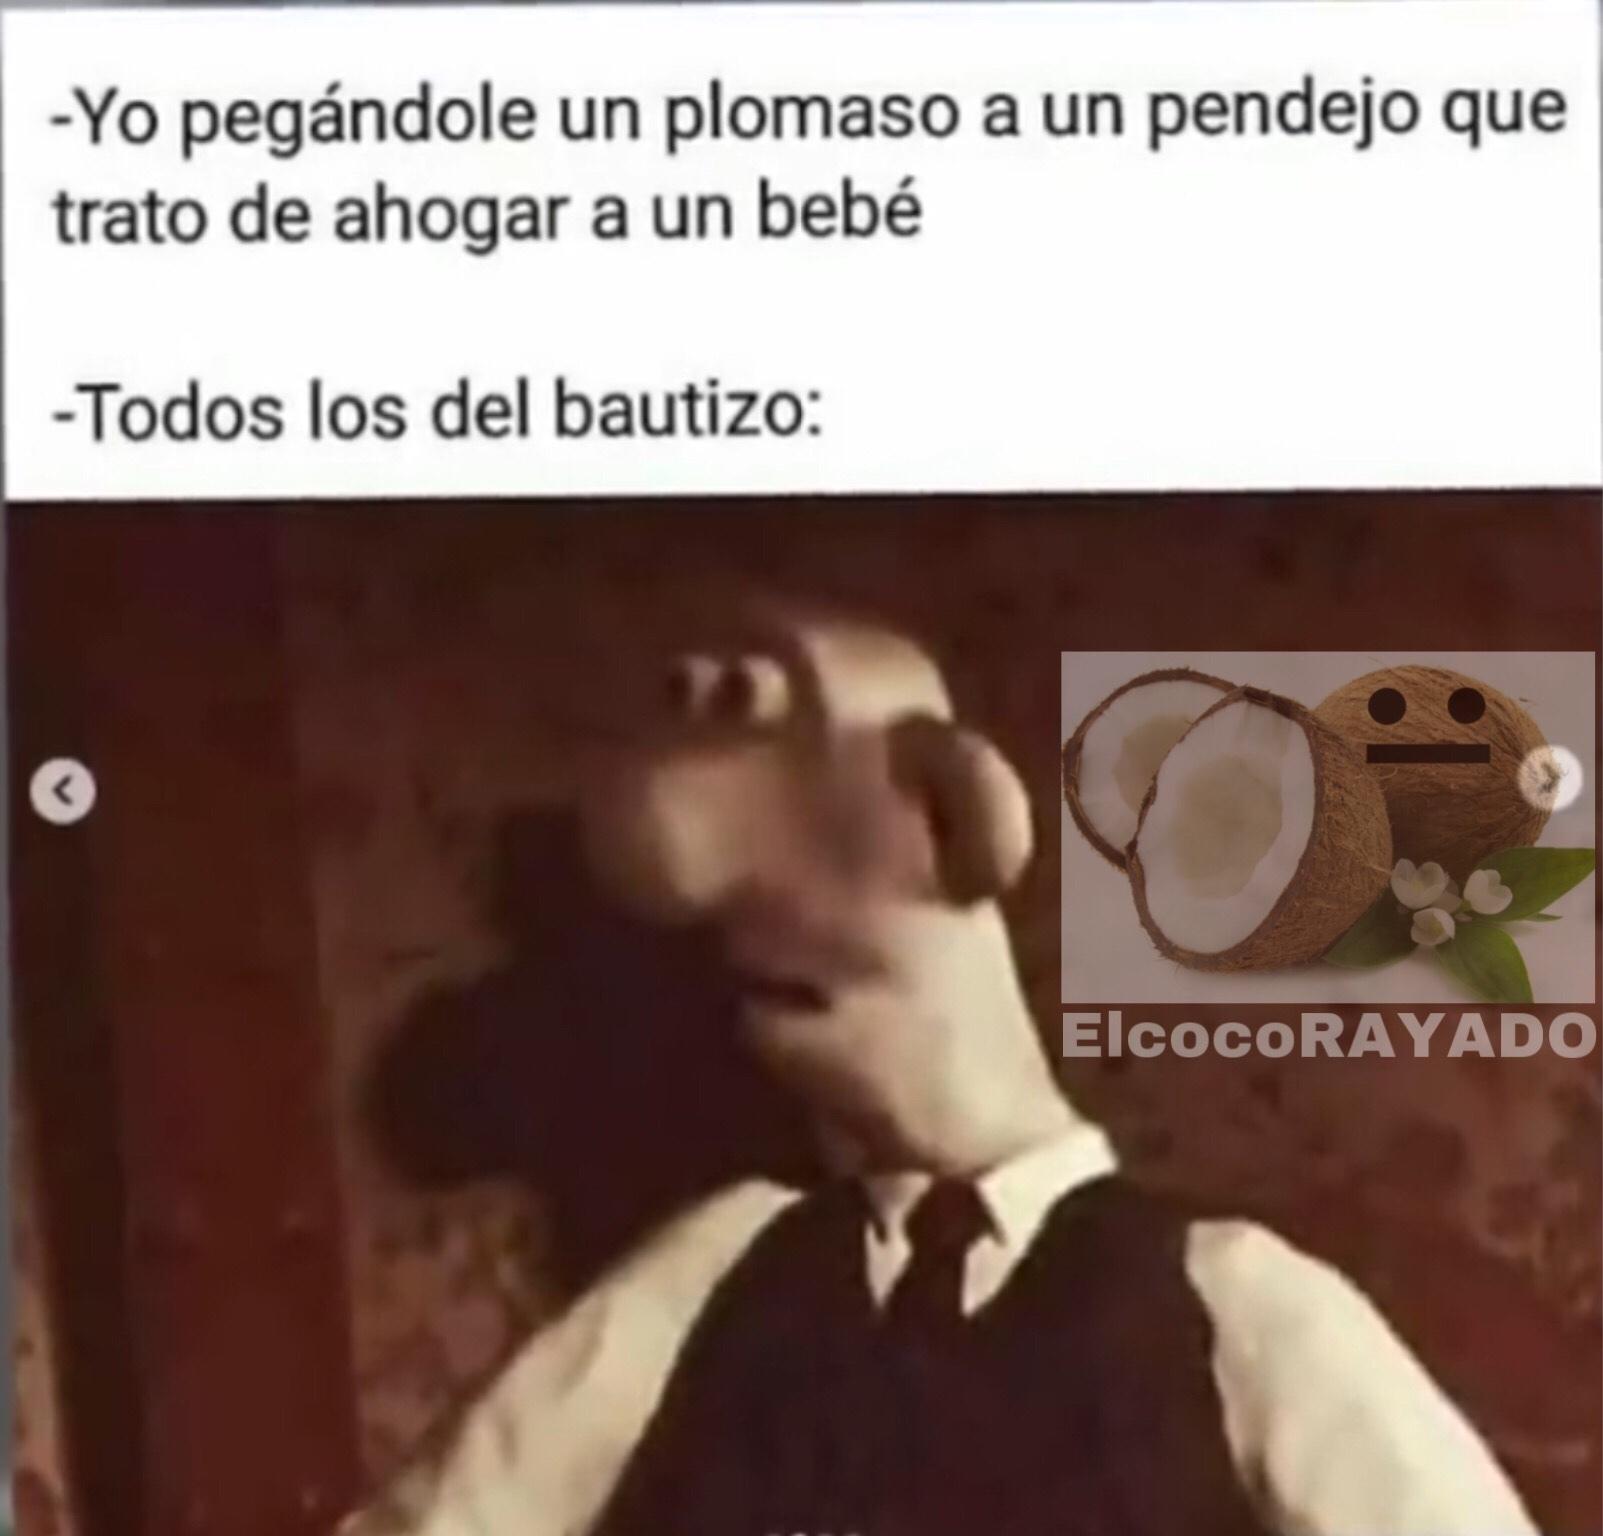 el bautizoXD - meme